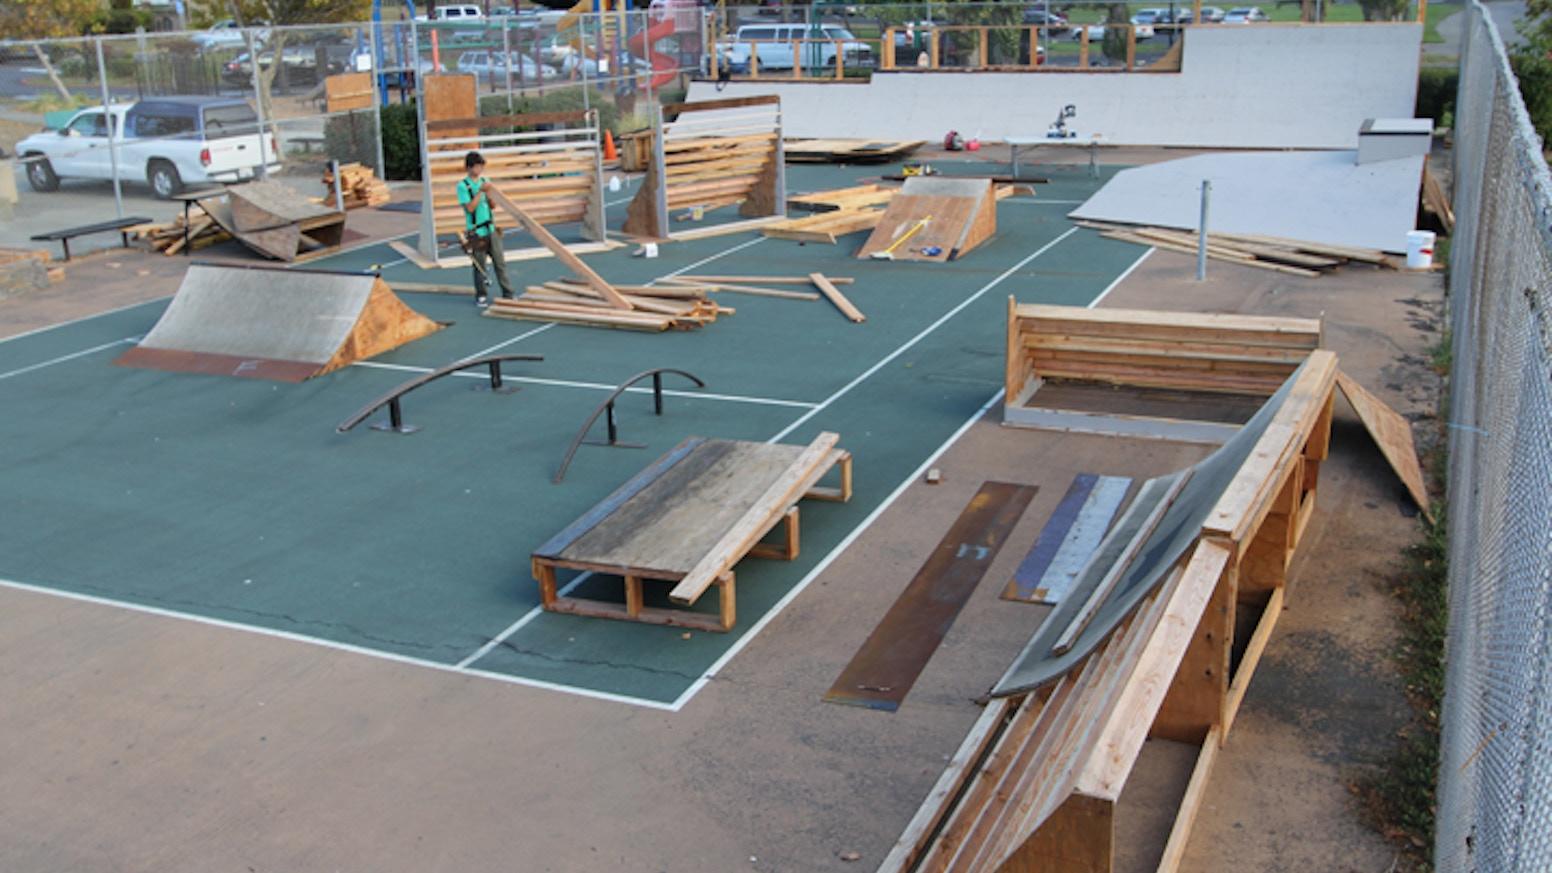 marin city art skate park by proof lab kickstarter